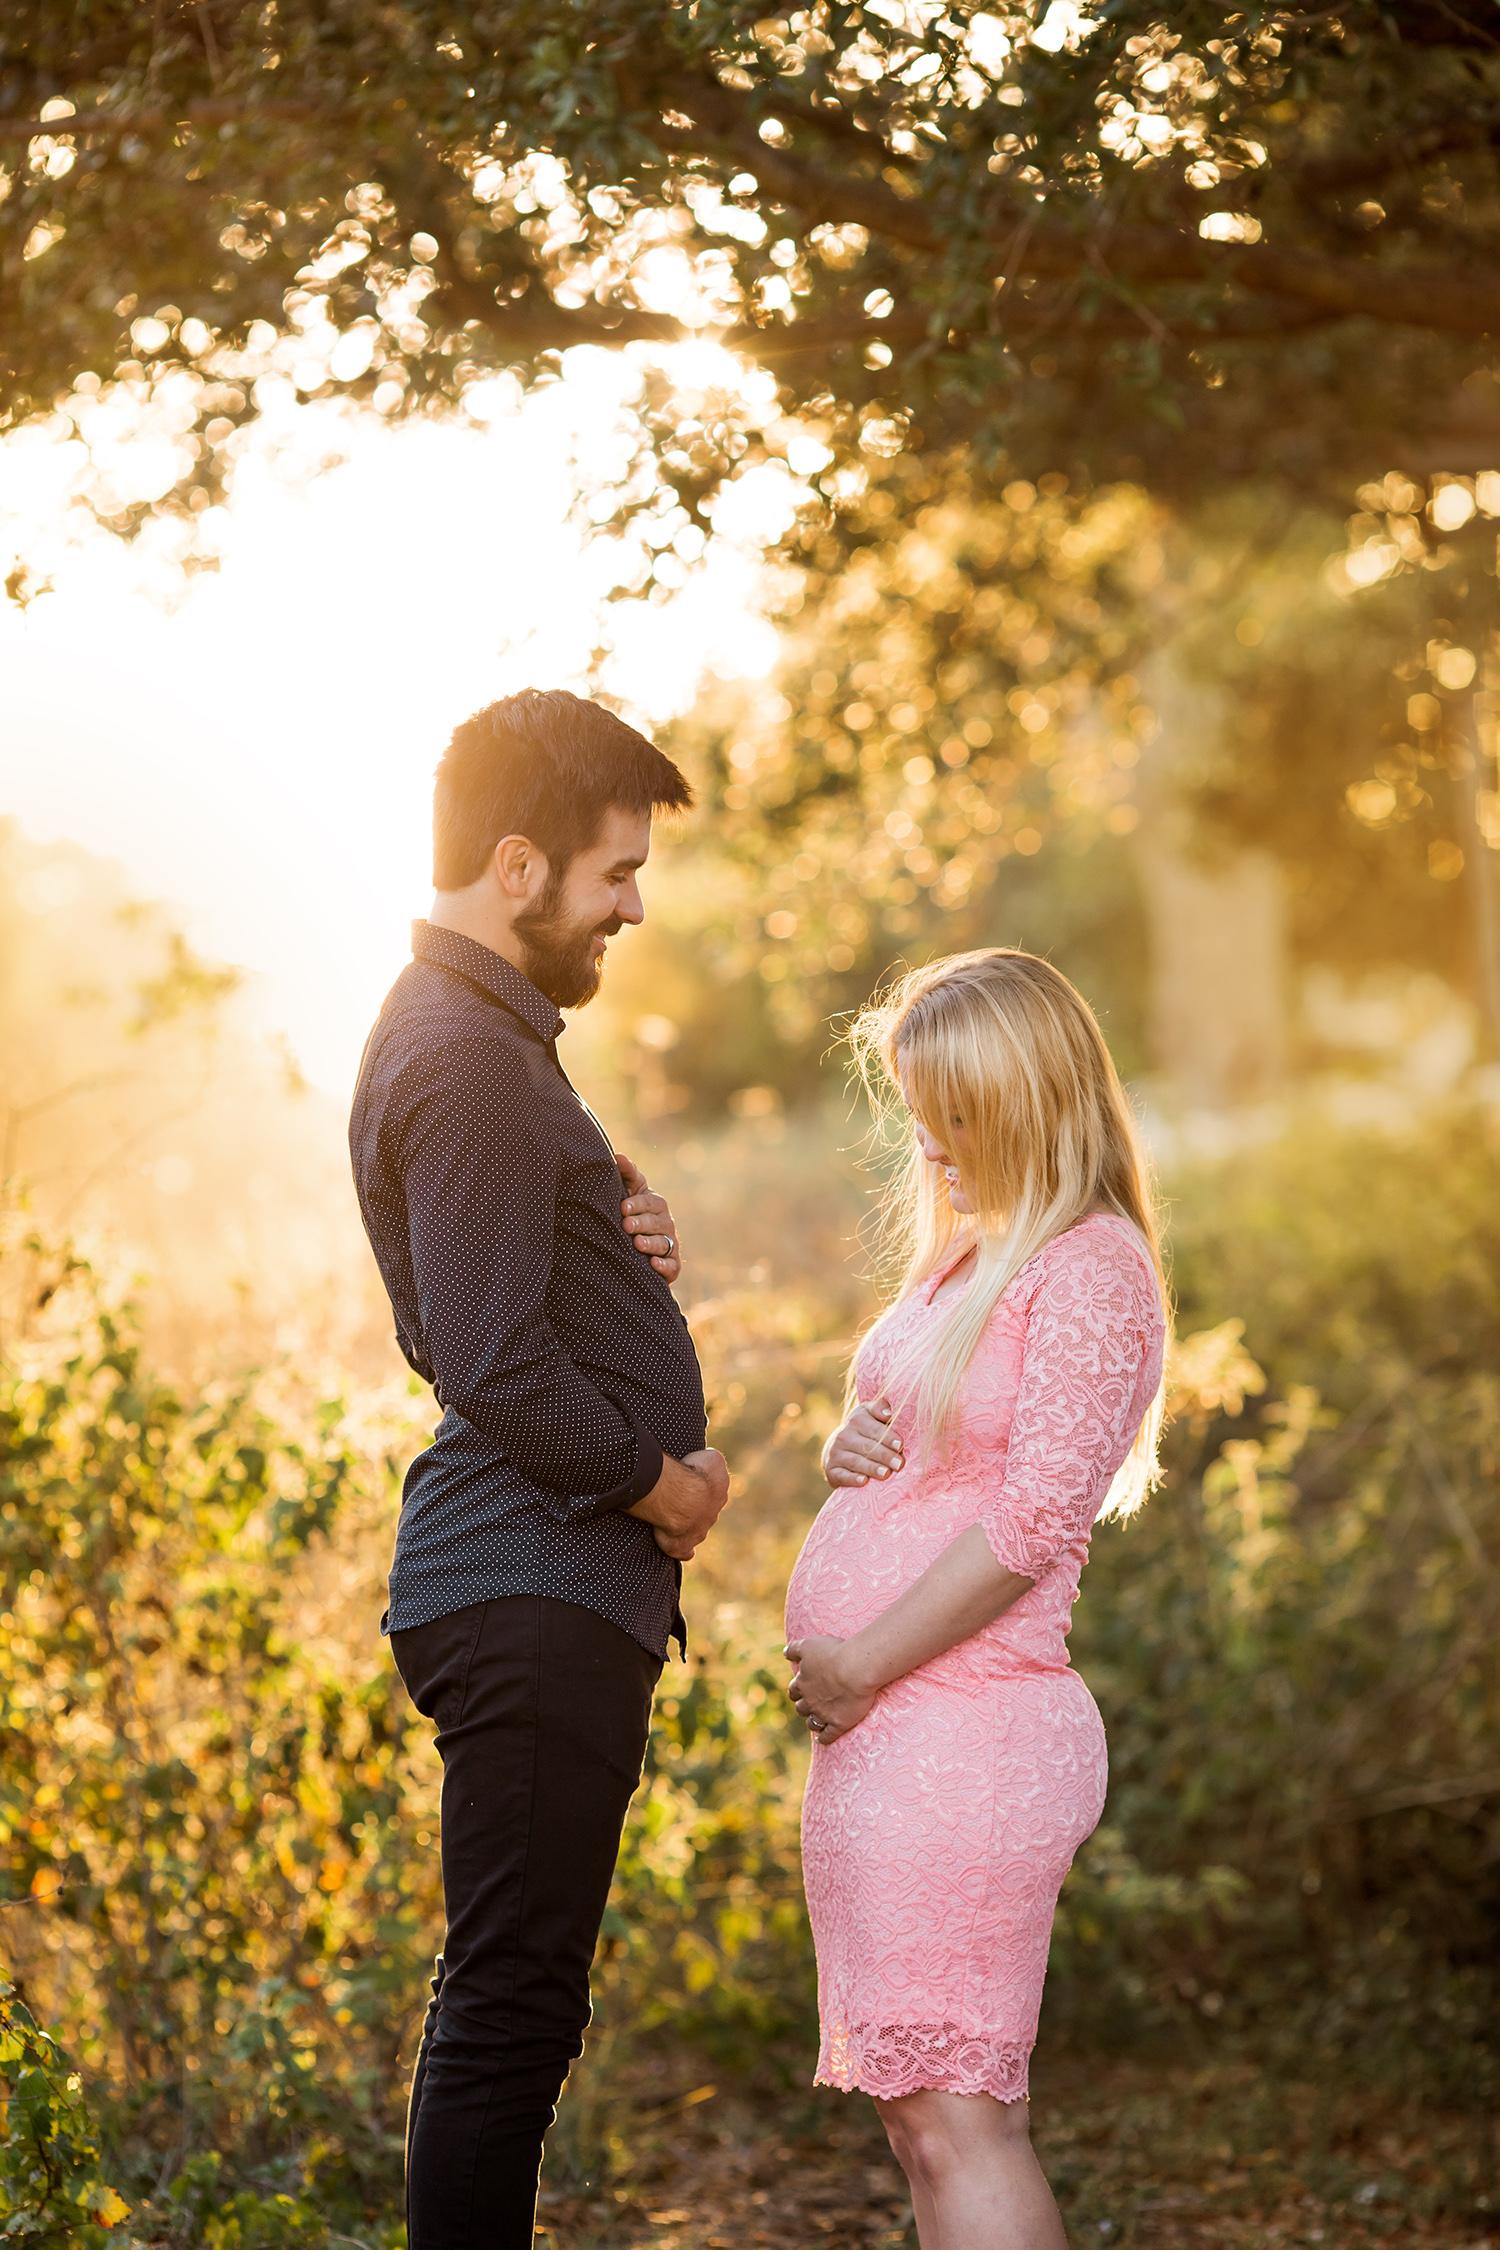 South-Florida-Boca-Raton-Maternity-Family-Photographer30.jpg